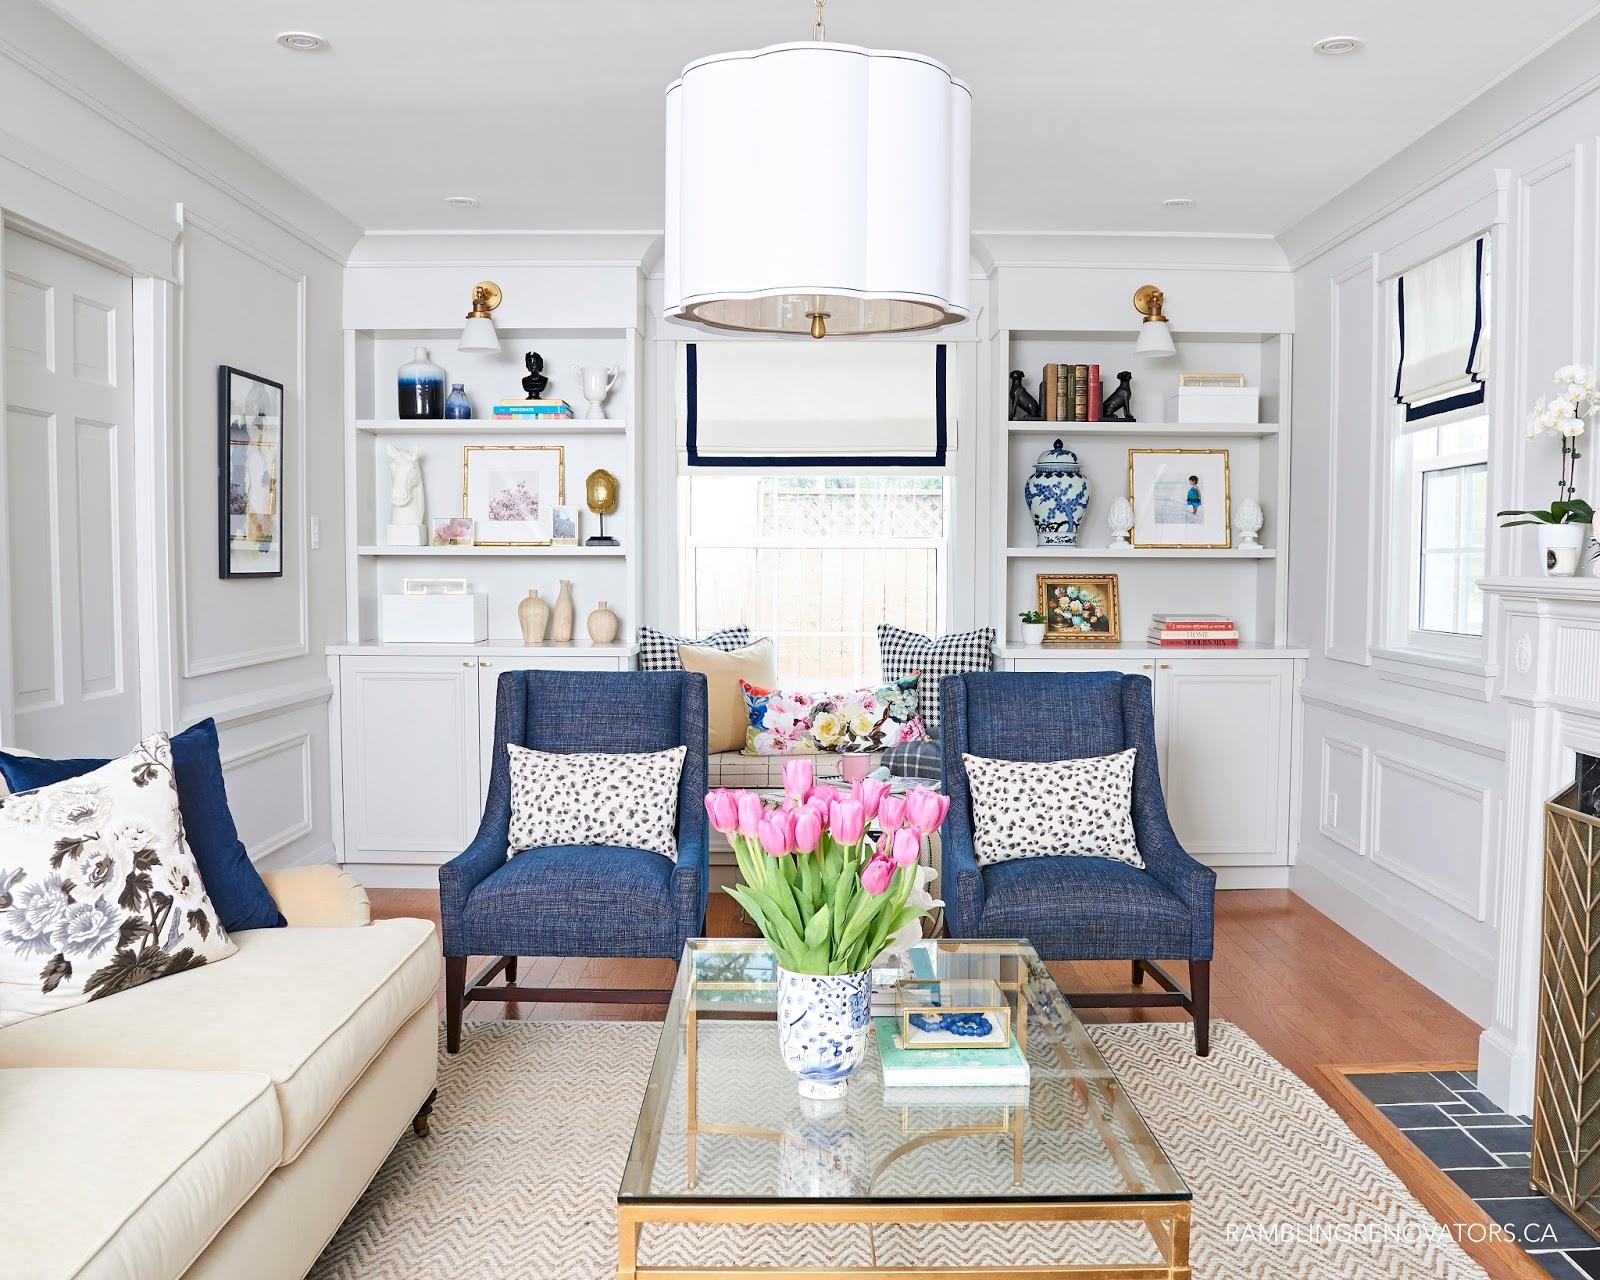 By Jen @ Rambling Renovators for One Room Challenge